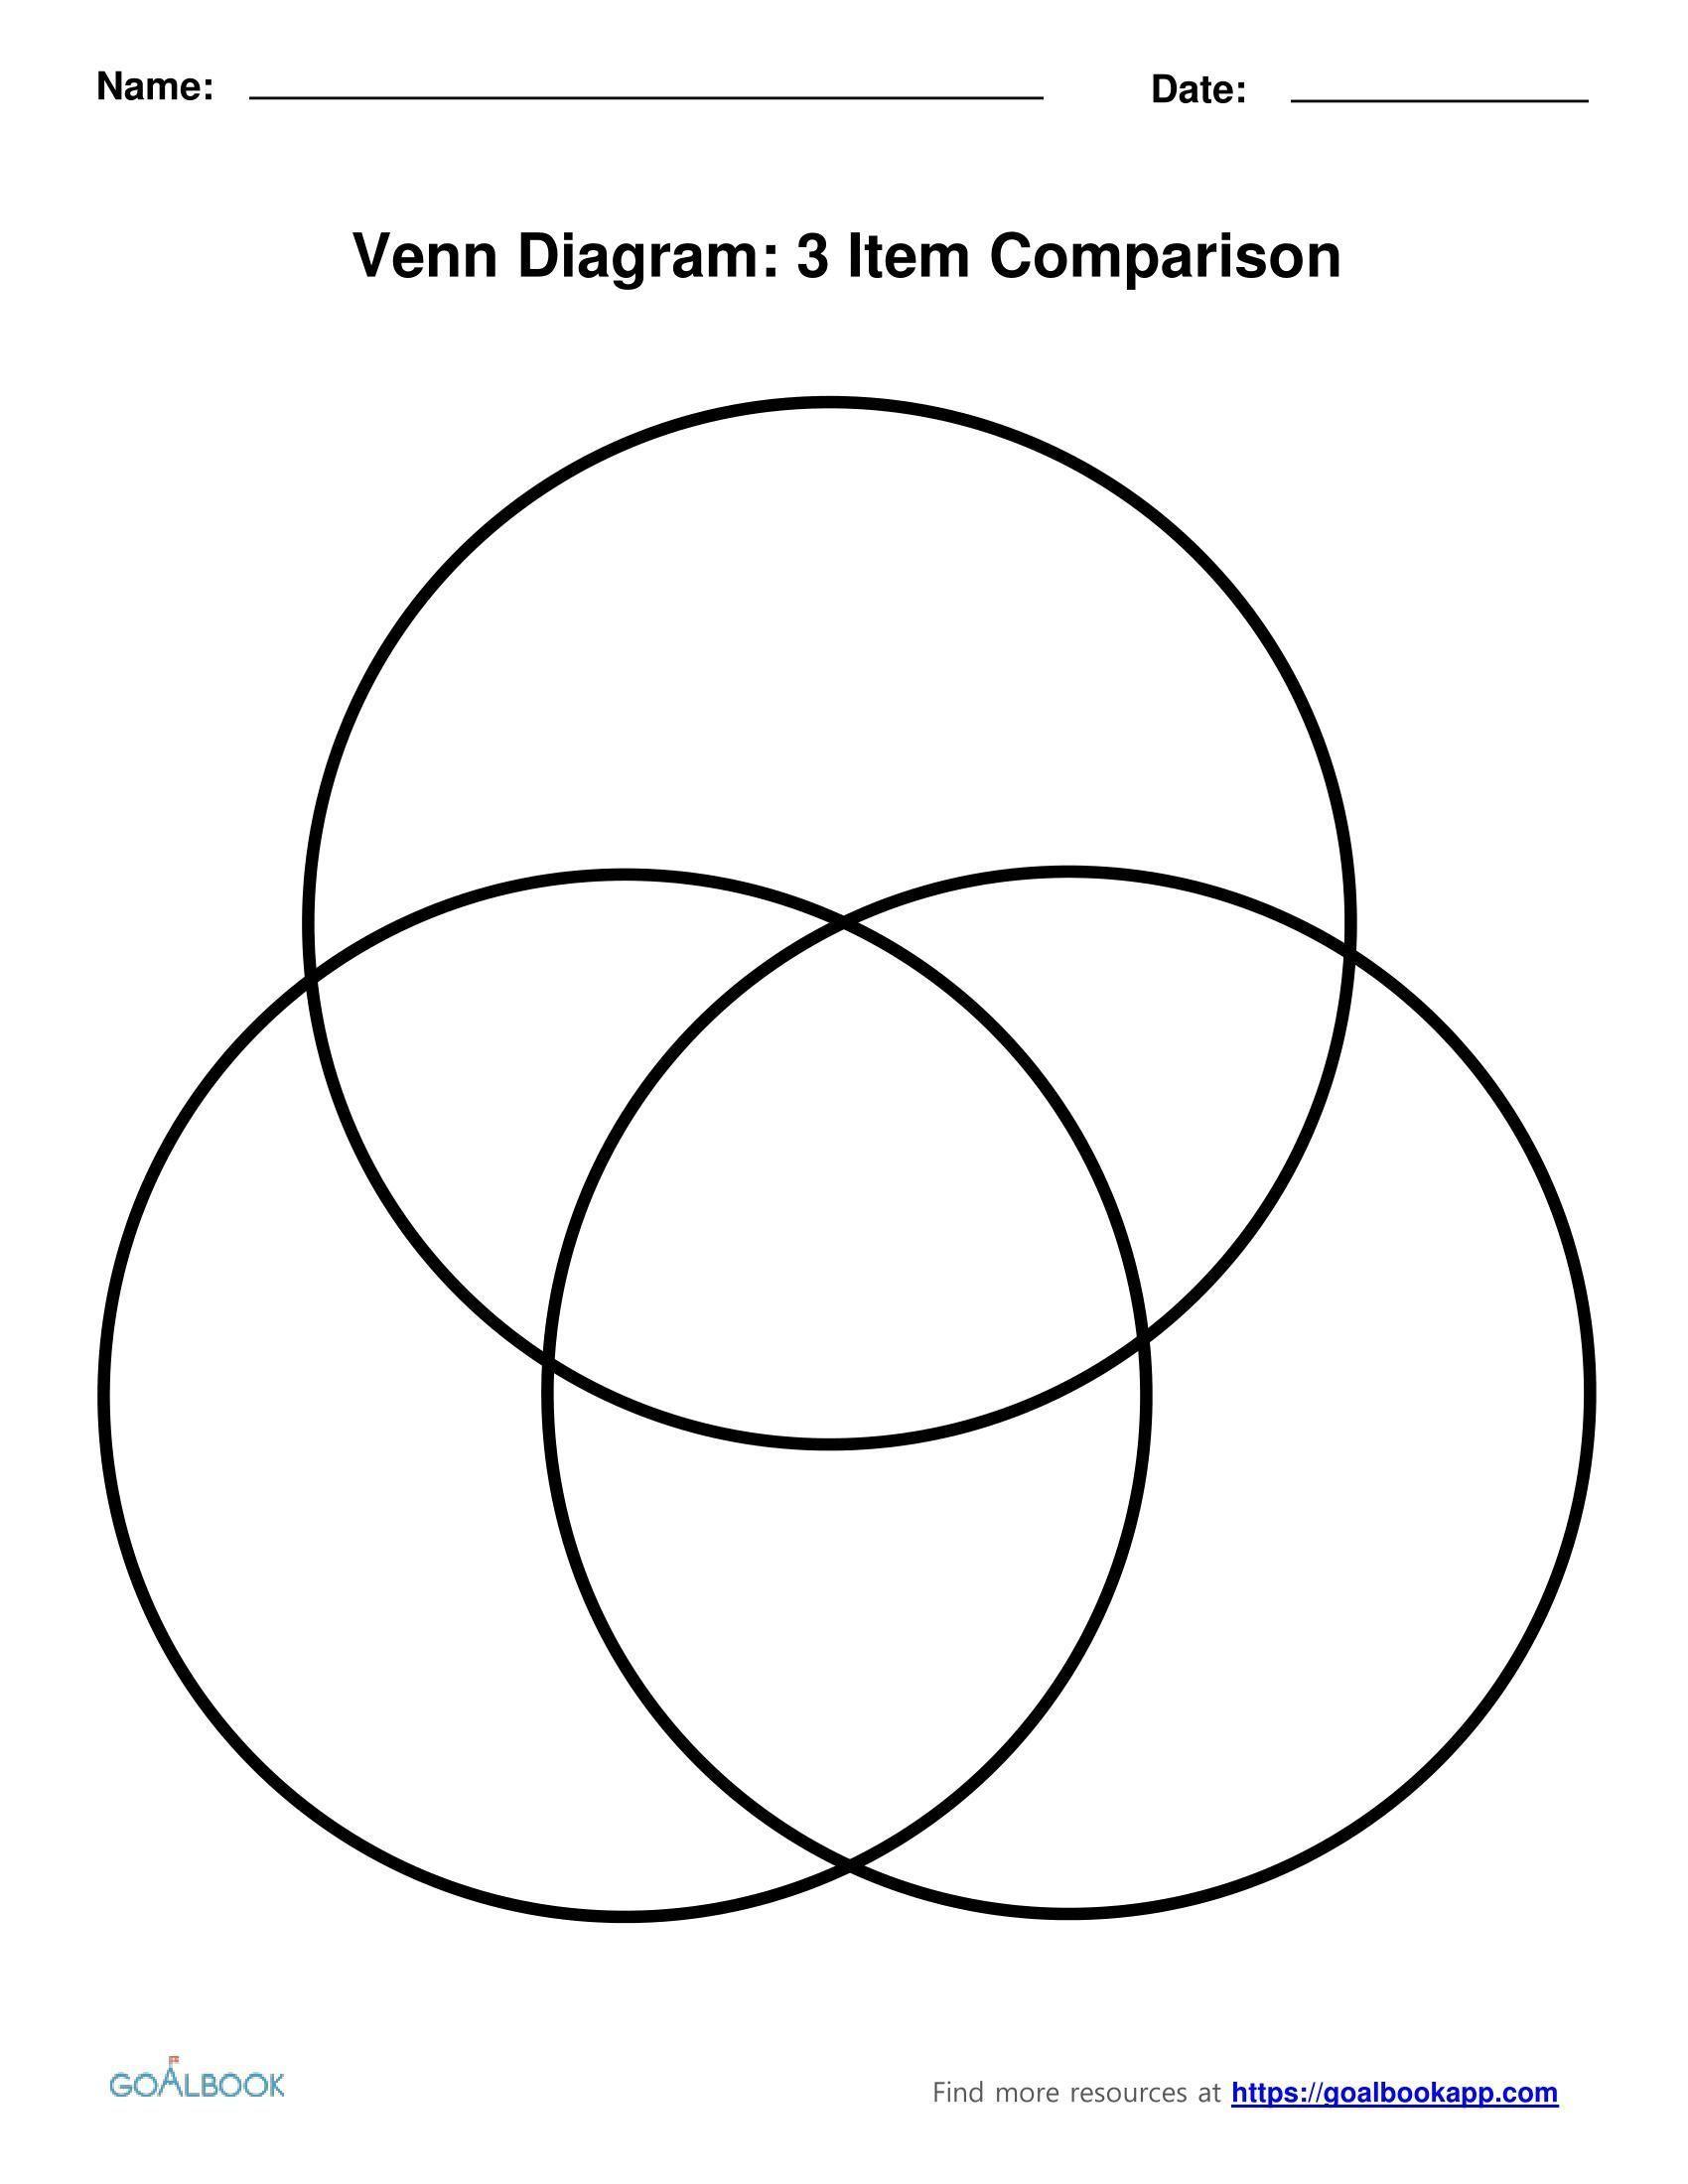 Printable Venn Diagram Printable Venn Diagram With Lines Elegant Free Printable Venn